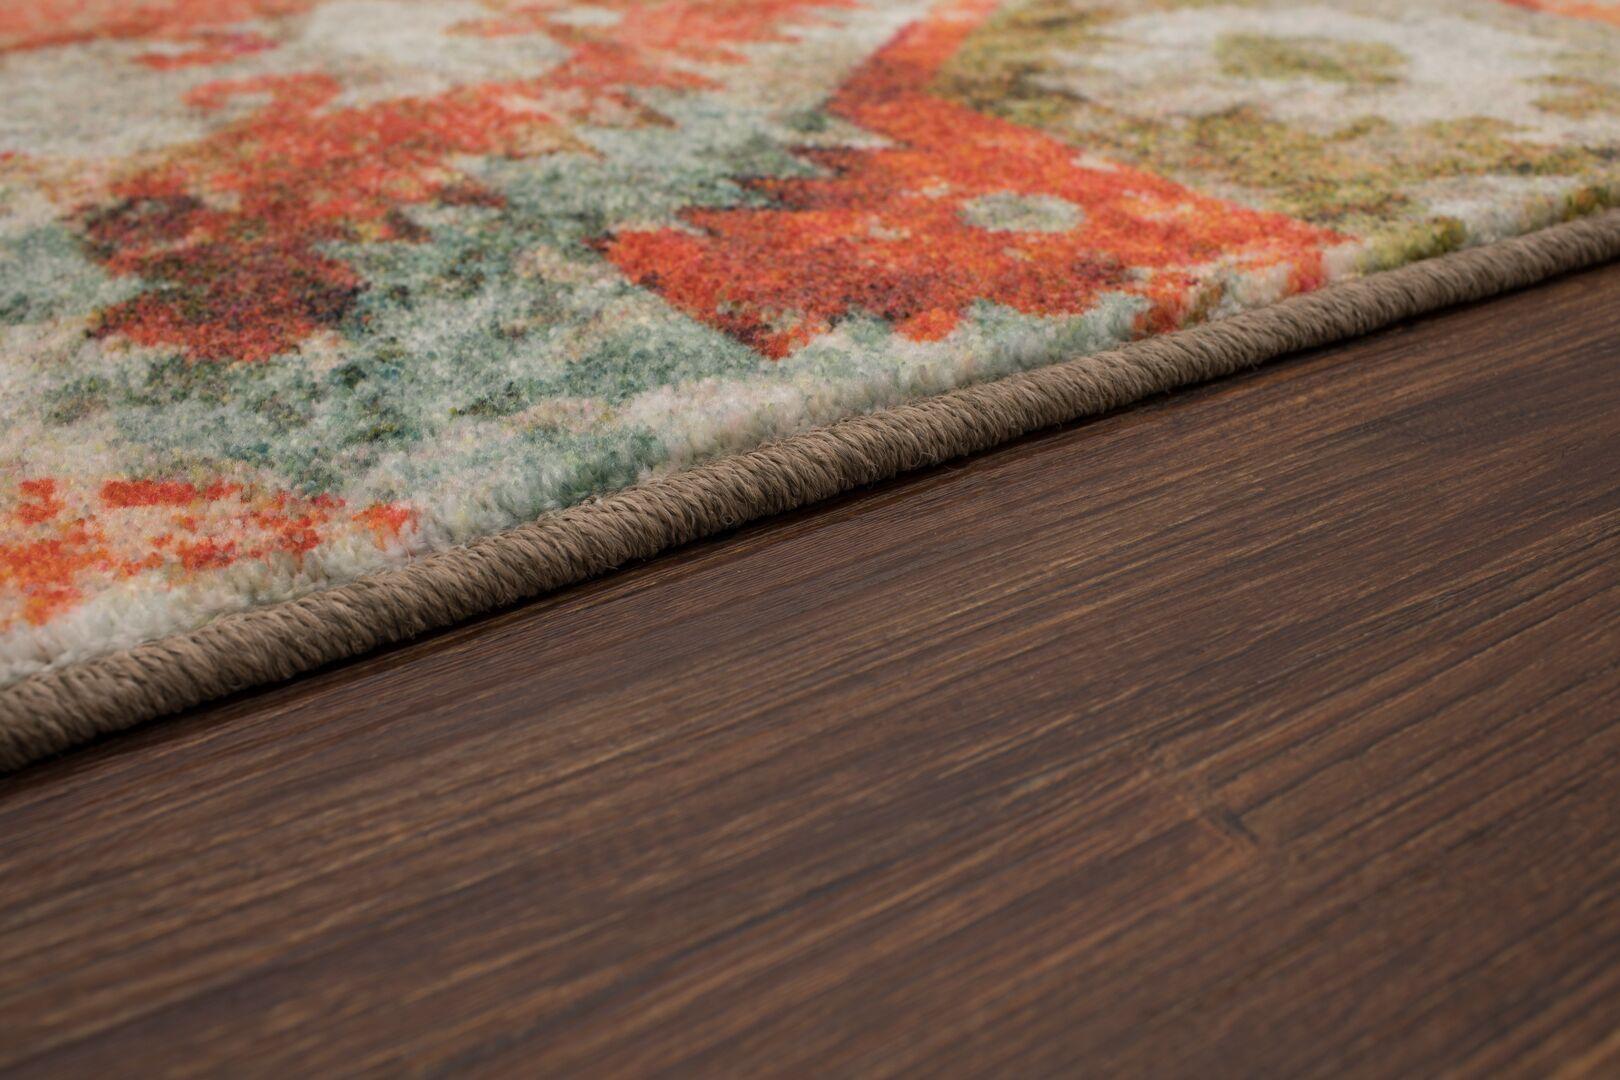 Barkhampstead Gray/Orange Area Rug Rug Size: Rectangle 5' x 8'